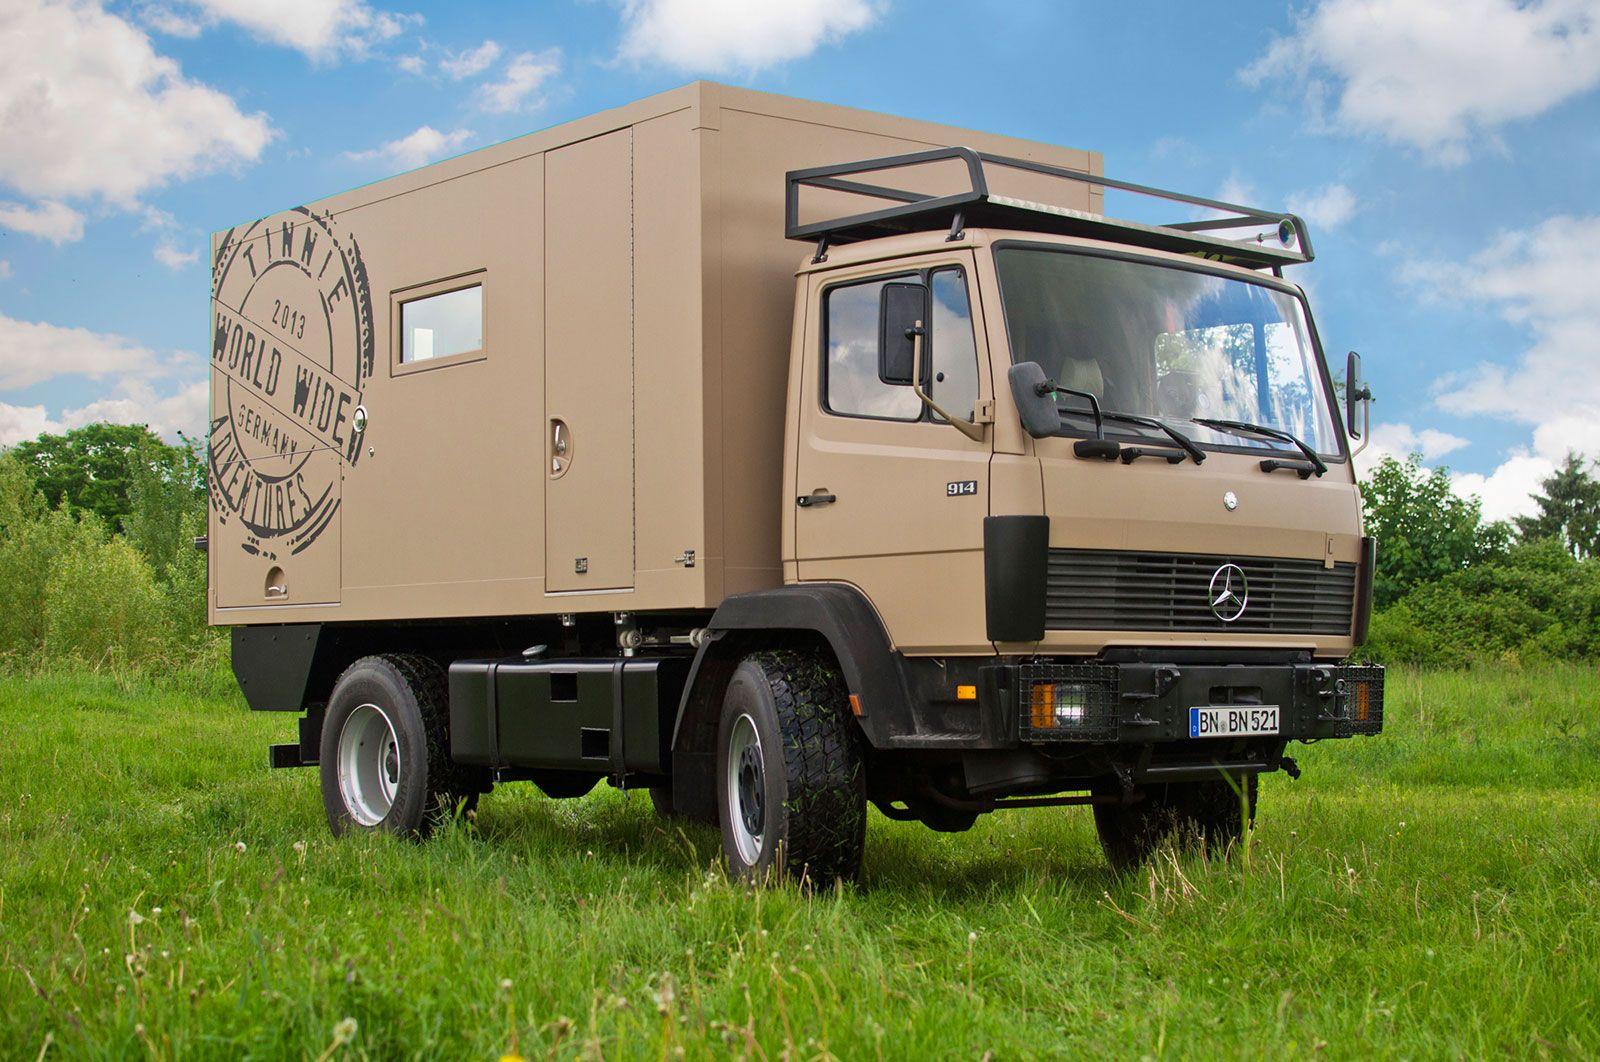 Expeditionsfahrzeuge Und Reisemobile Expeditionsfahrzeug Reisemobil Fernreisemobil